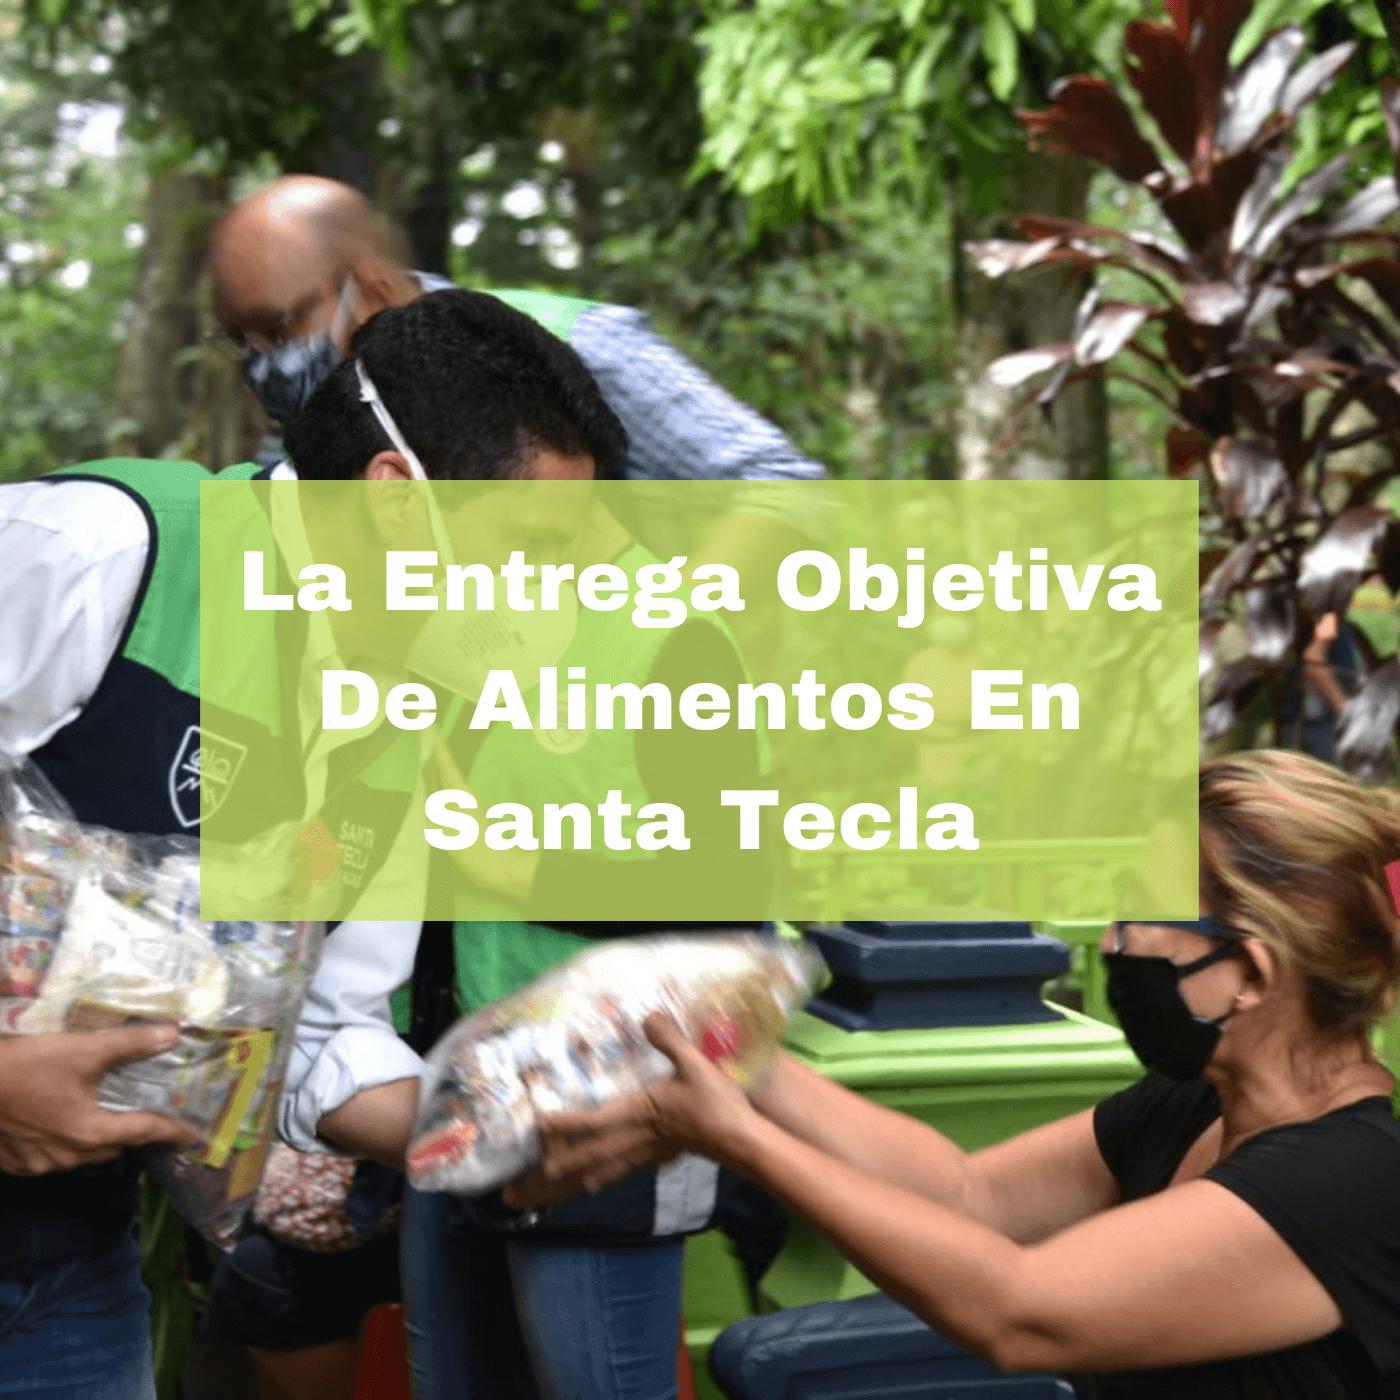 La Entrega Objetiva De Alimentos En Santa Tecla. Foto Portada. Infografía. Roberto d'Aubuisson. 2021